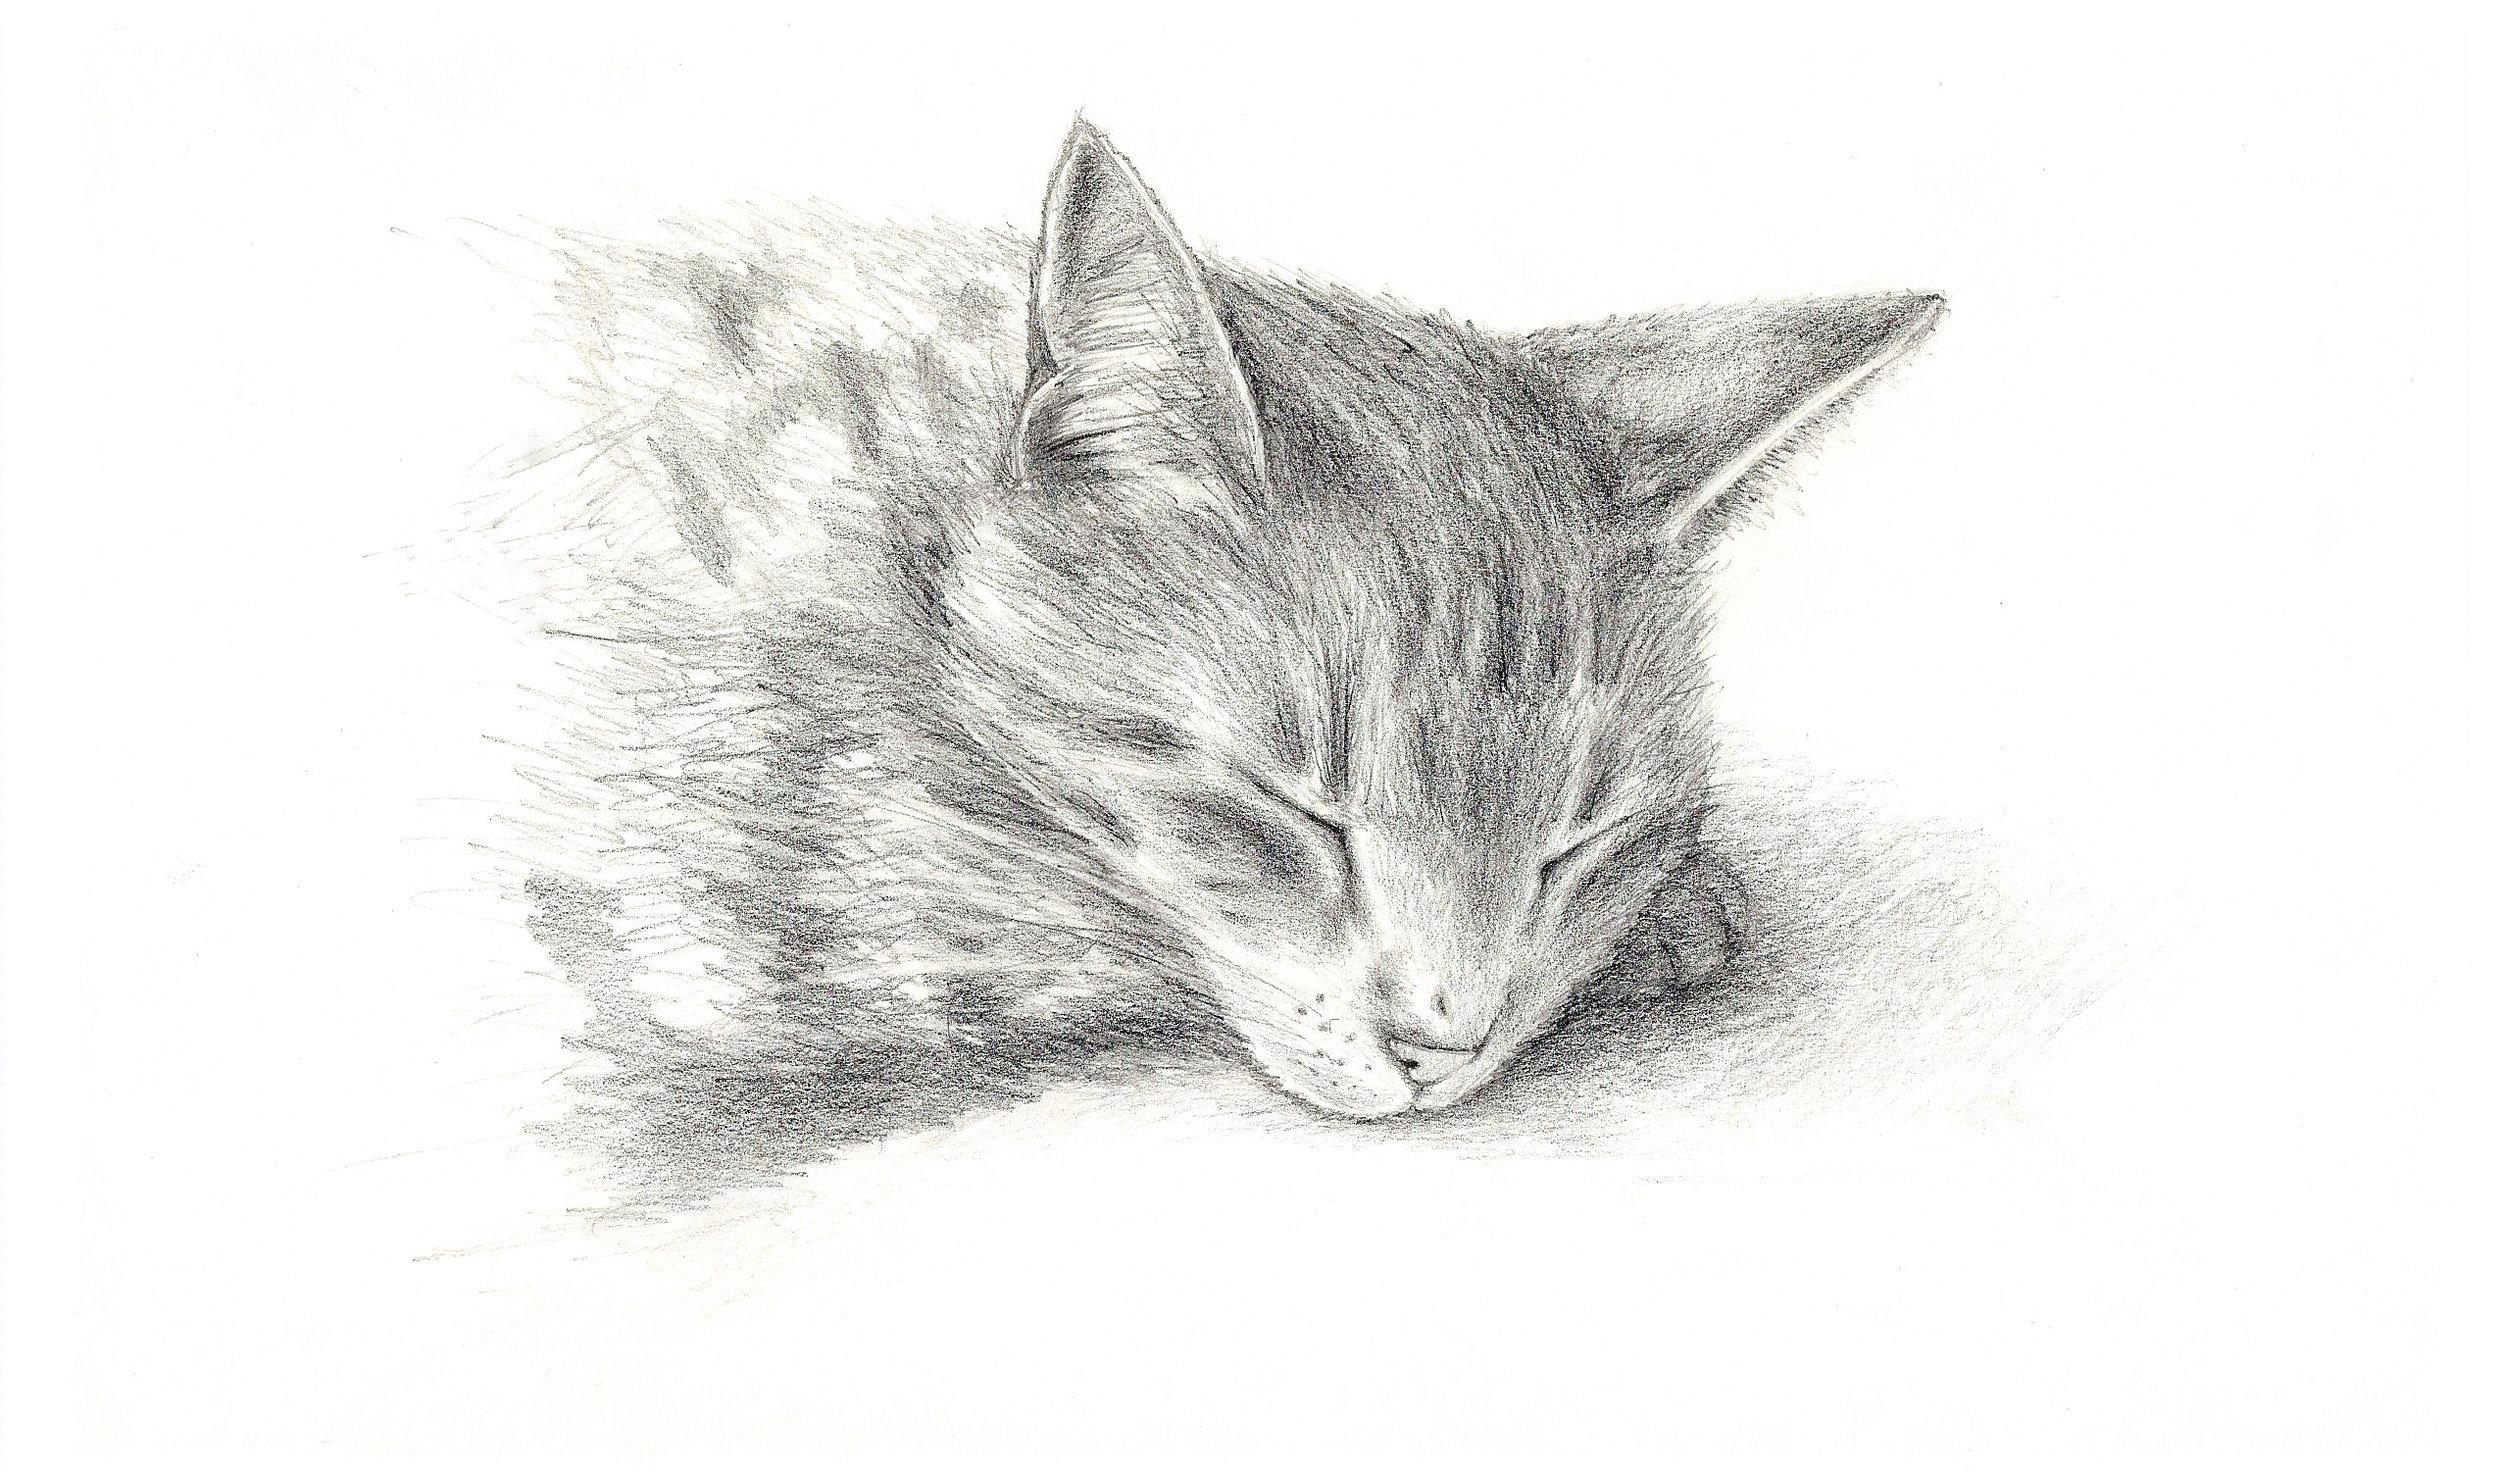 Sketch Page Scan 1.jpg